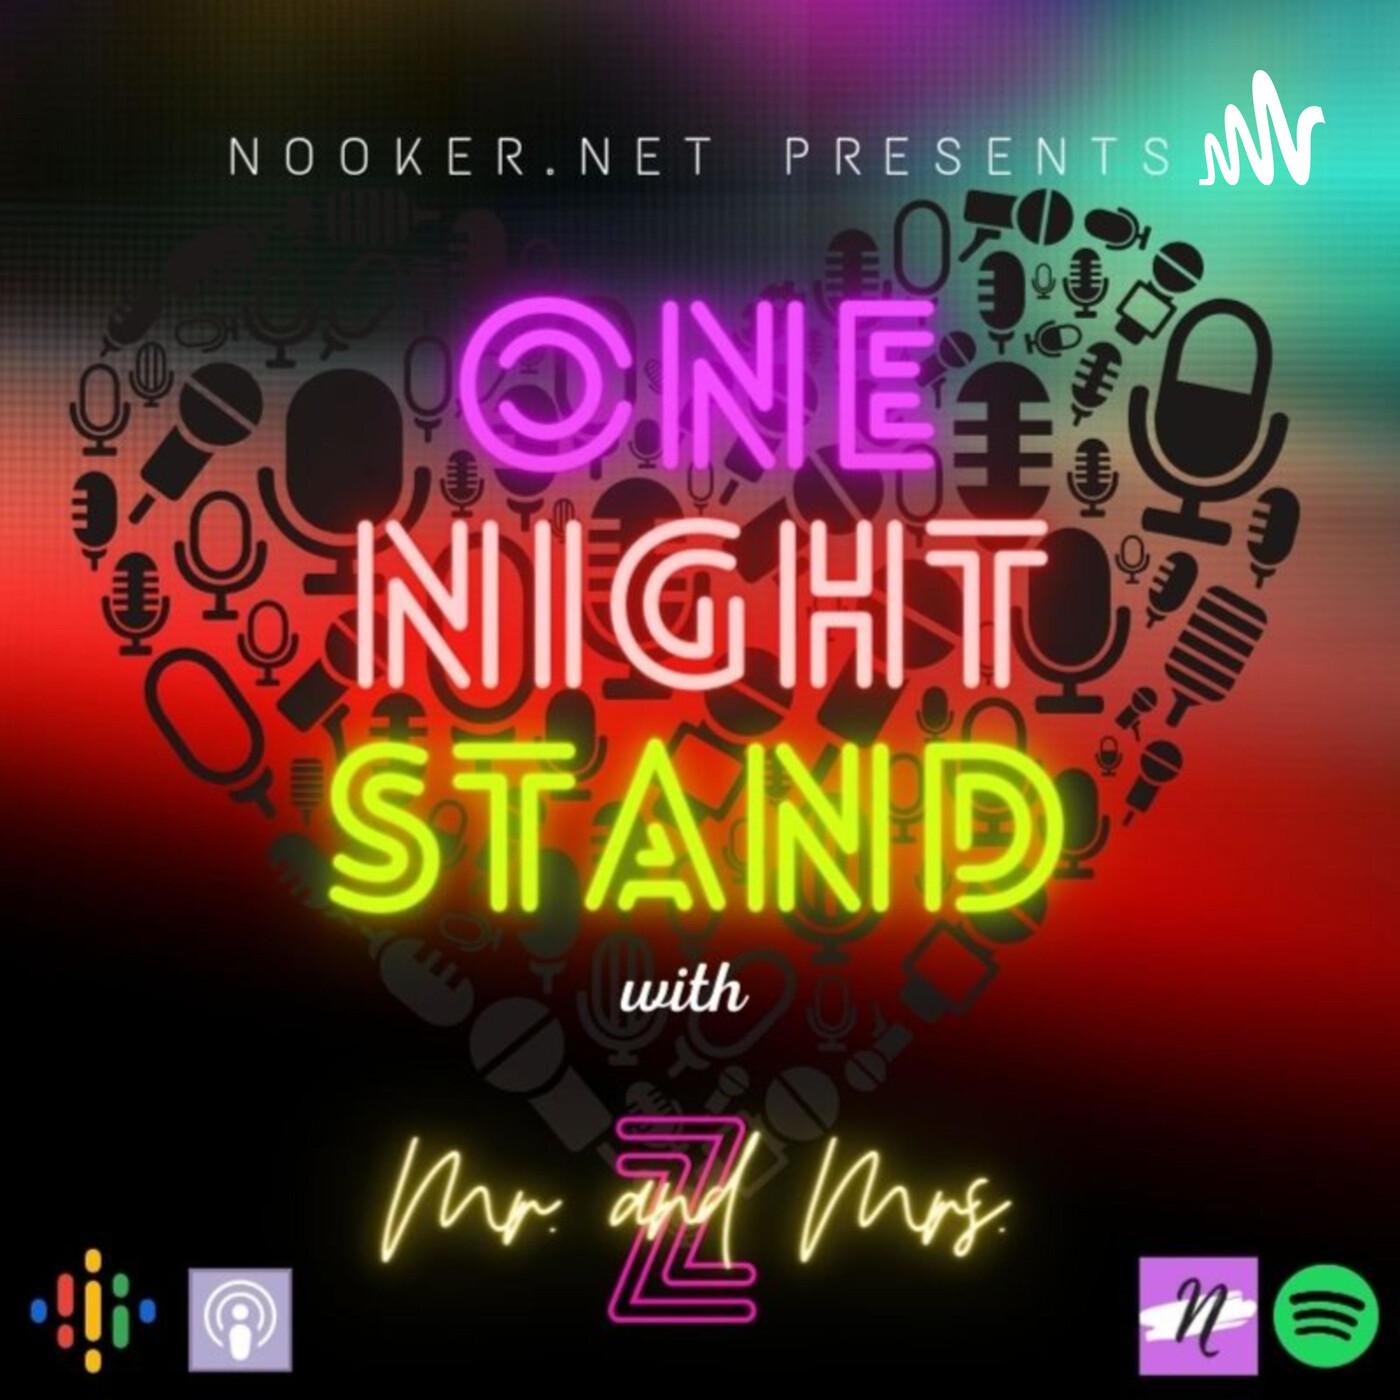 One Night Stand (Trailer)